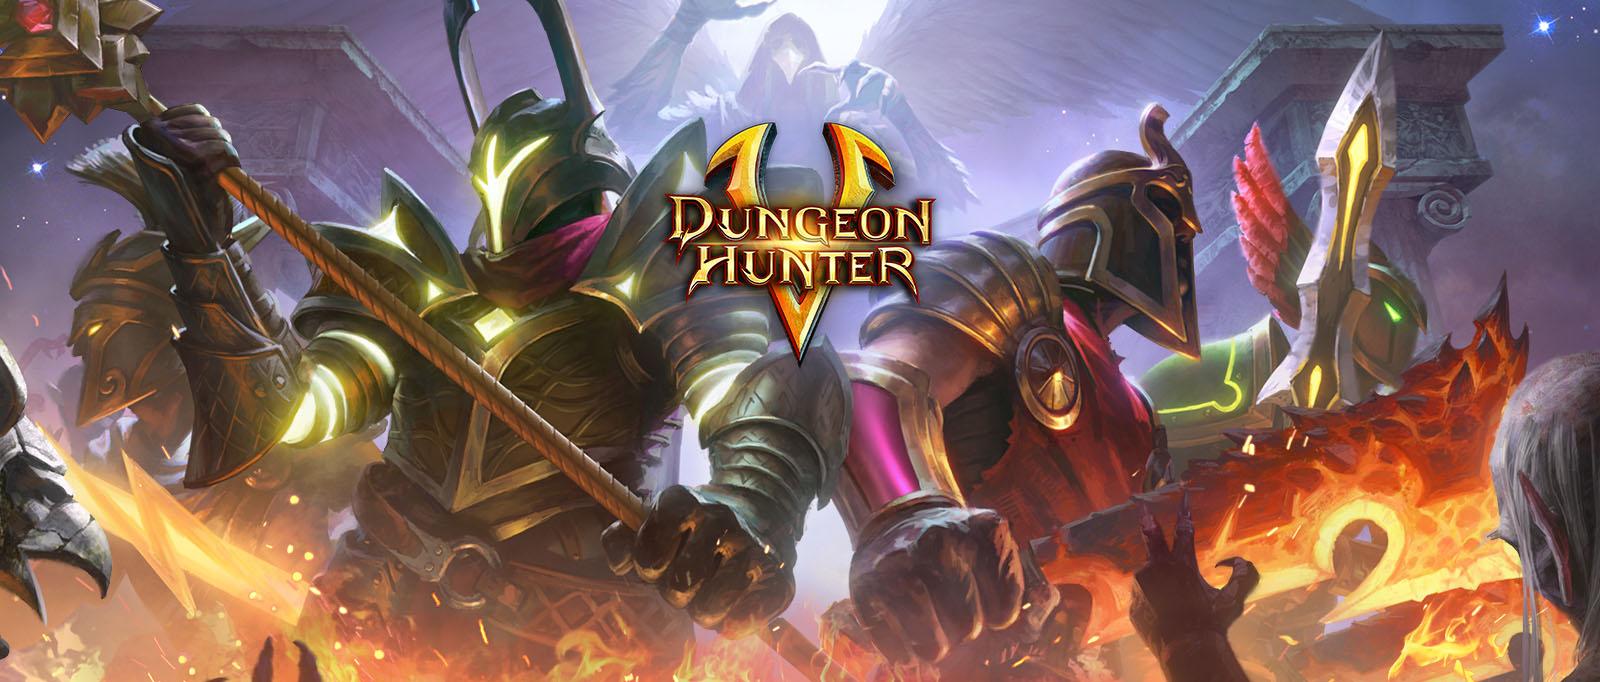 Dungeon Hunter 5